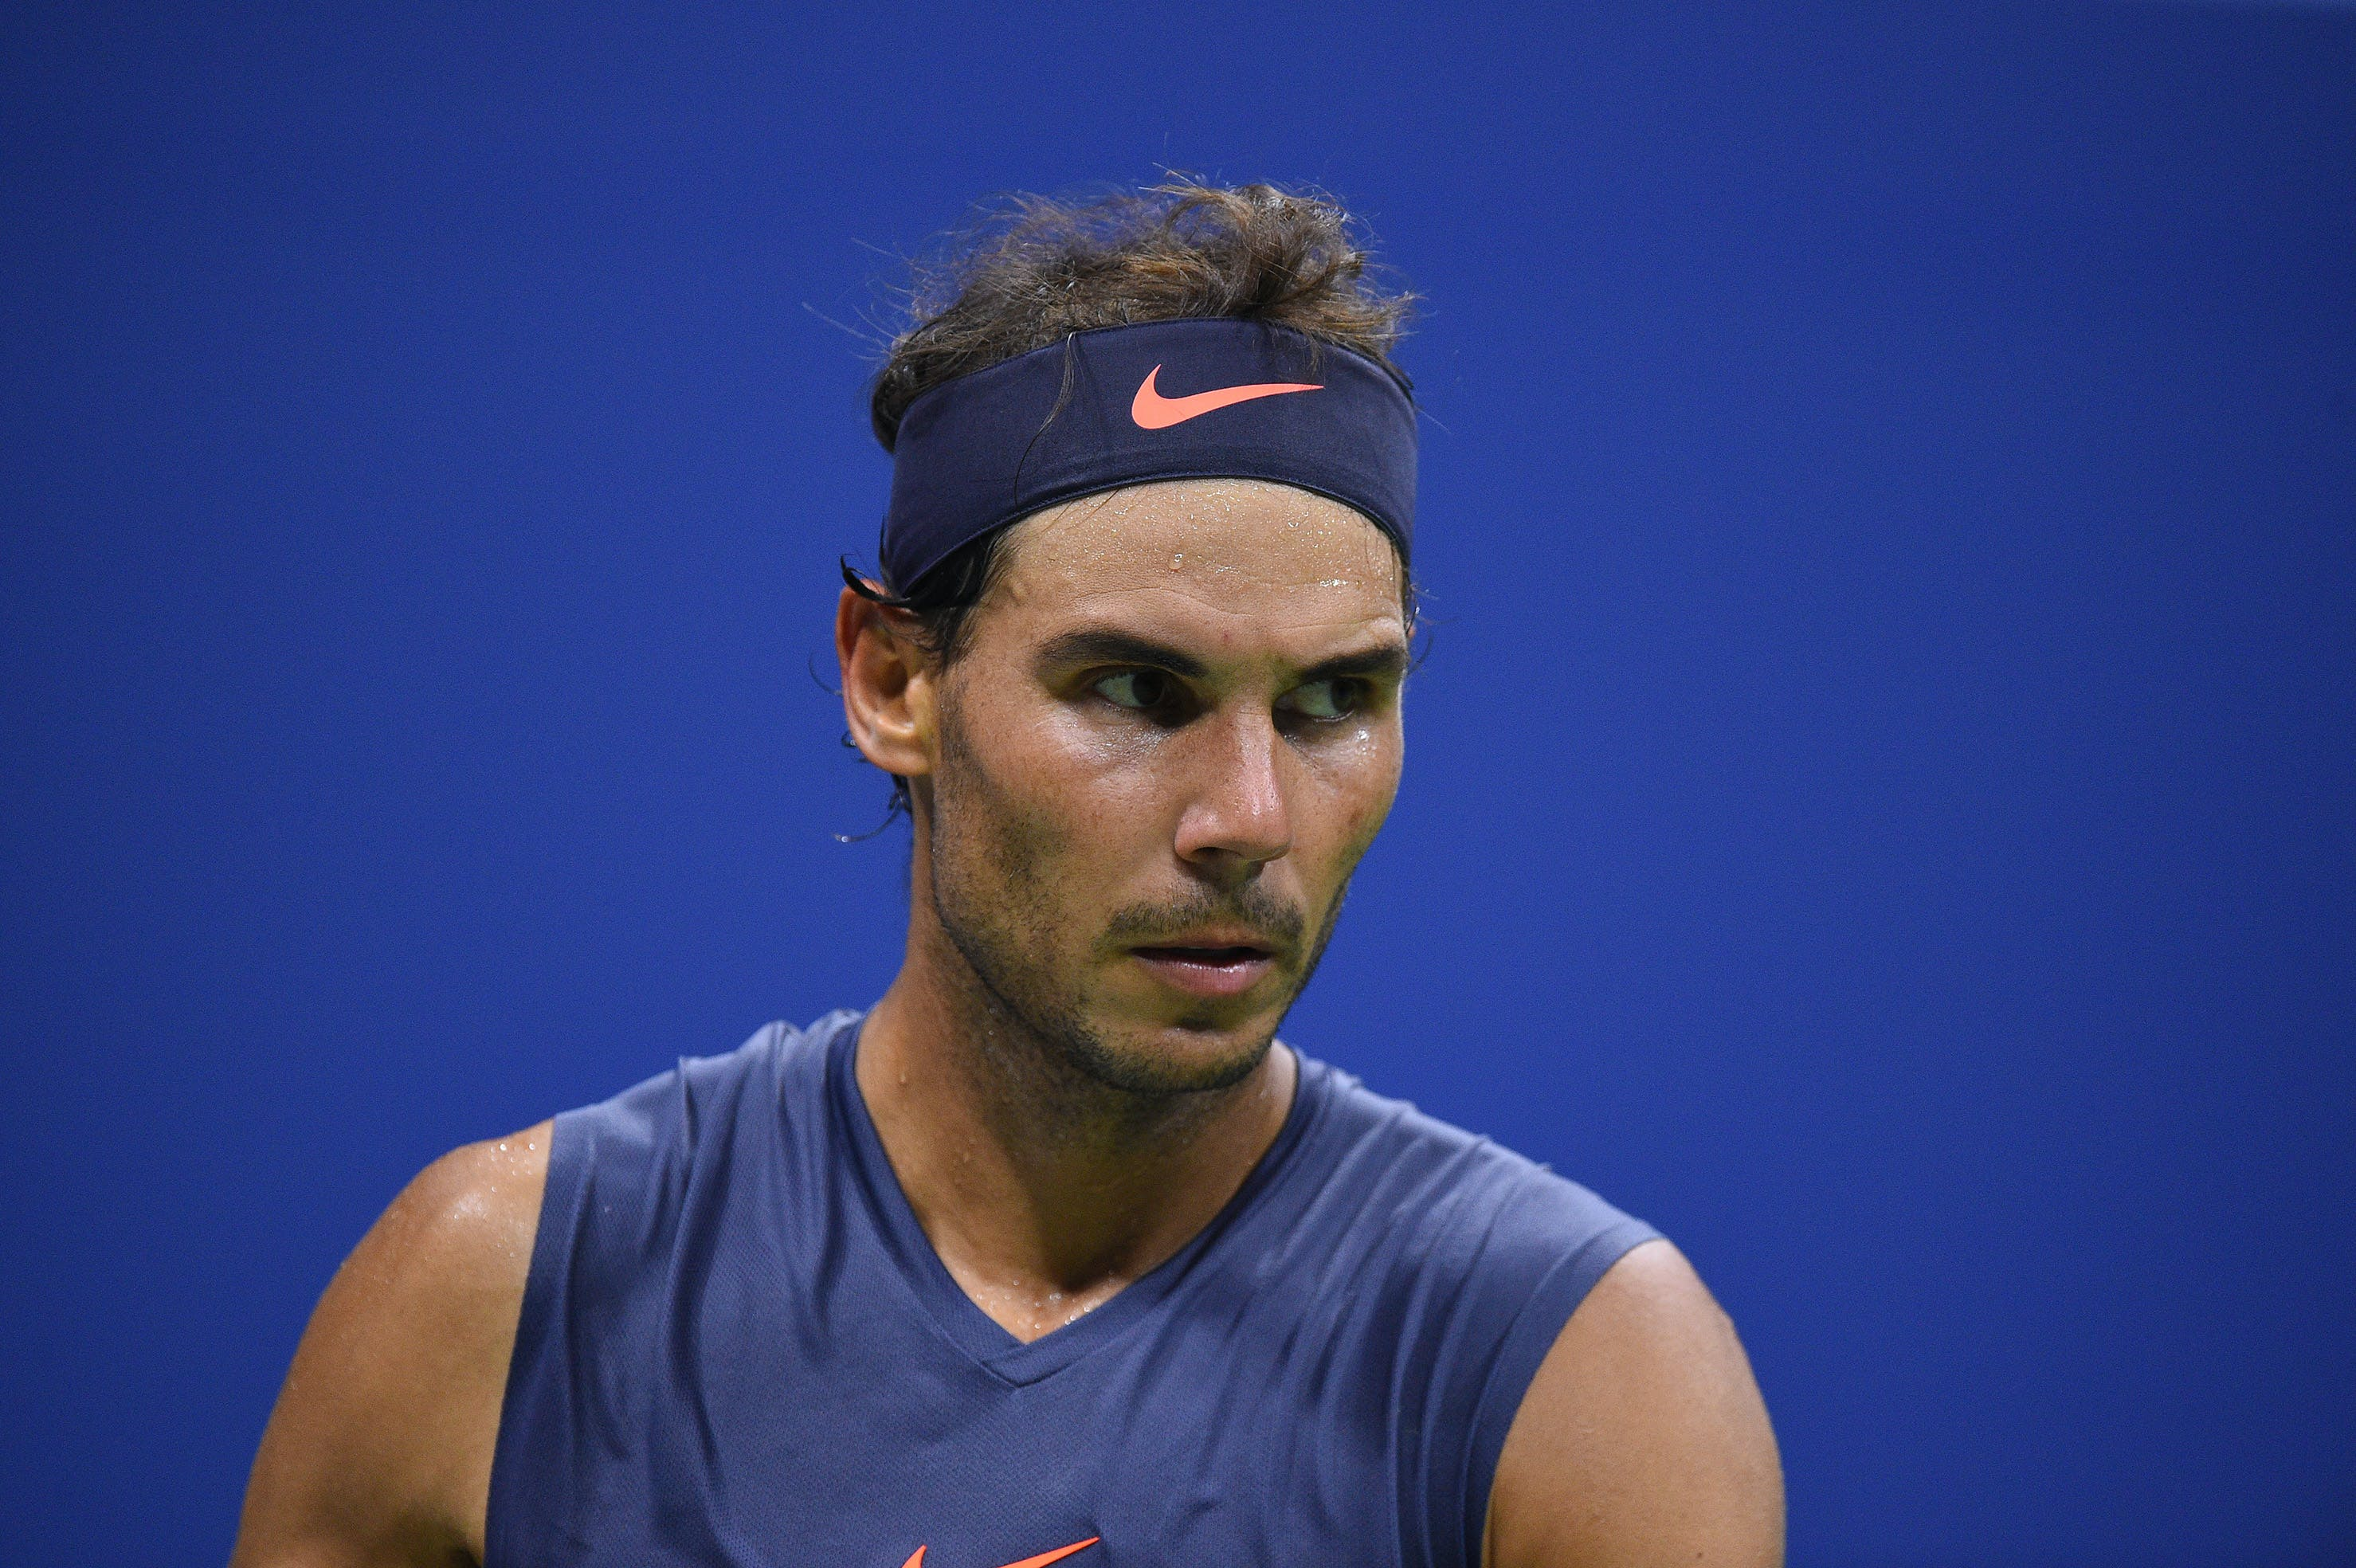 Rafael Nadal sweating and lokking US Open 2018